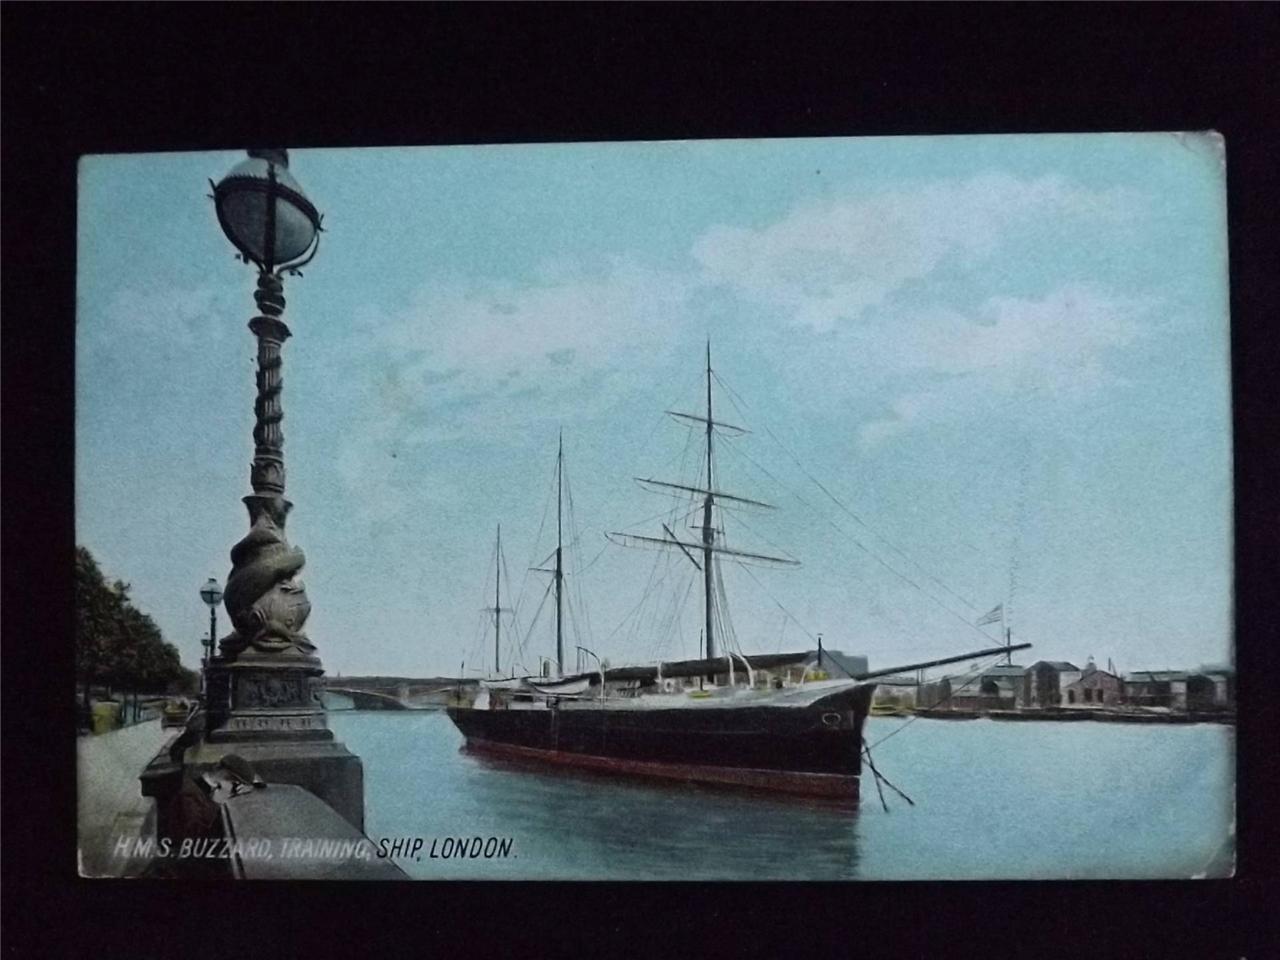 OLD-POSTCARD-OF-HMS-BUZZARD-TRAINING-SHIP-LONDON-USED-1905